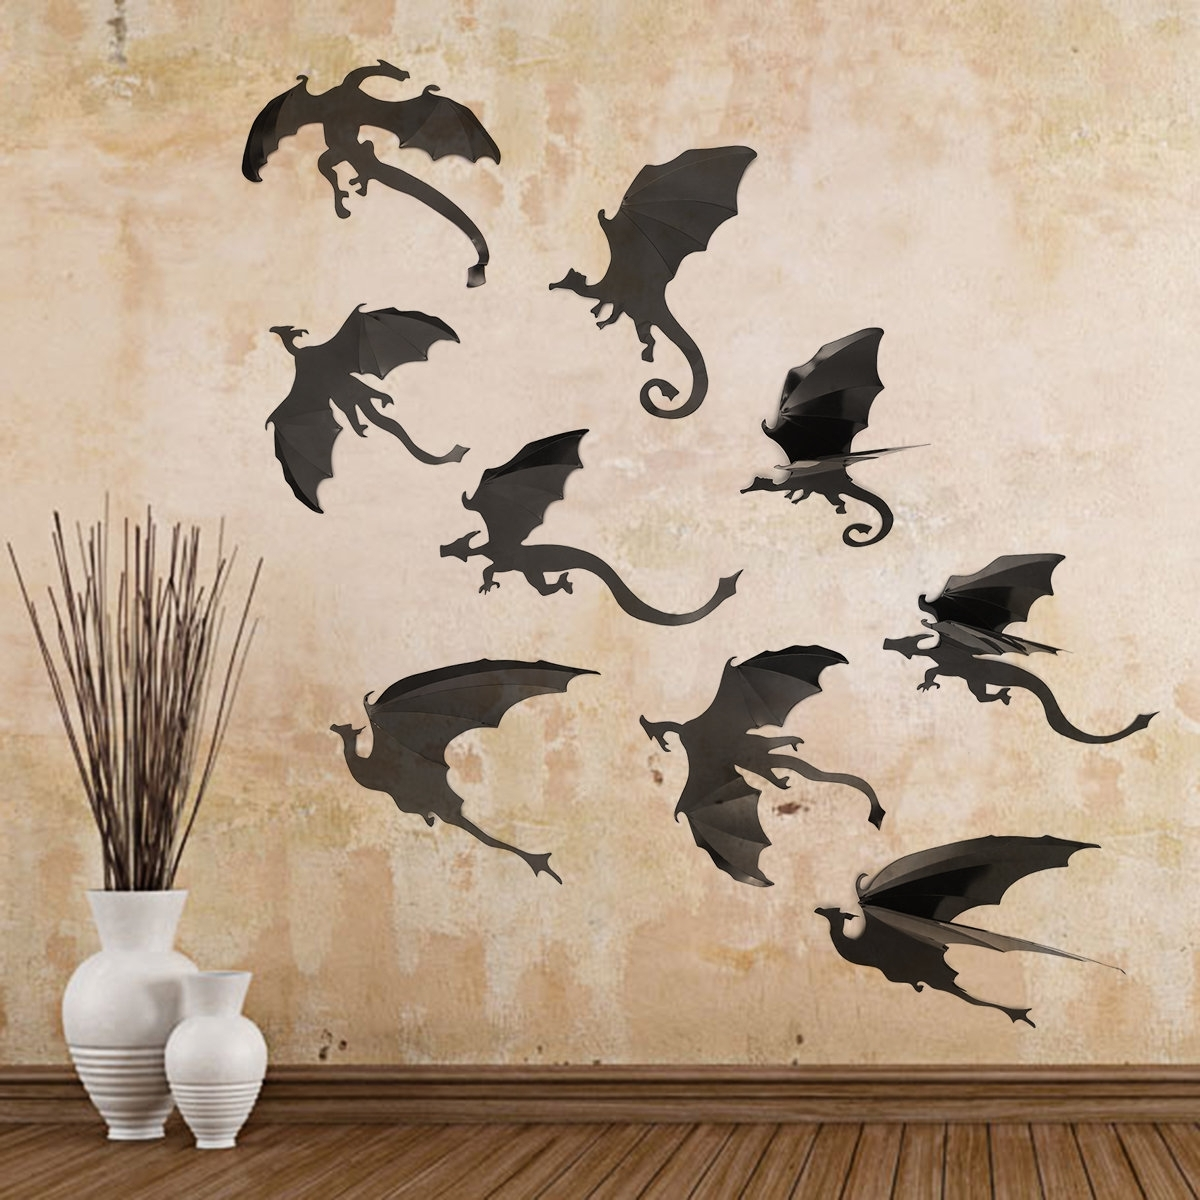 7Pcs/set Halloween Decoration Pvc Wall Stickers 3D Dragon Decorative In Dragon Wall Art (Photo 5 of 20)